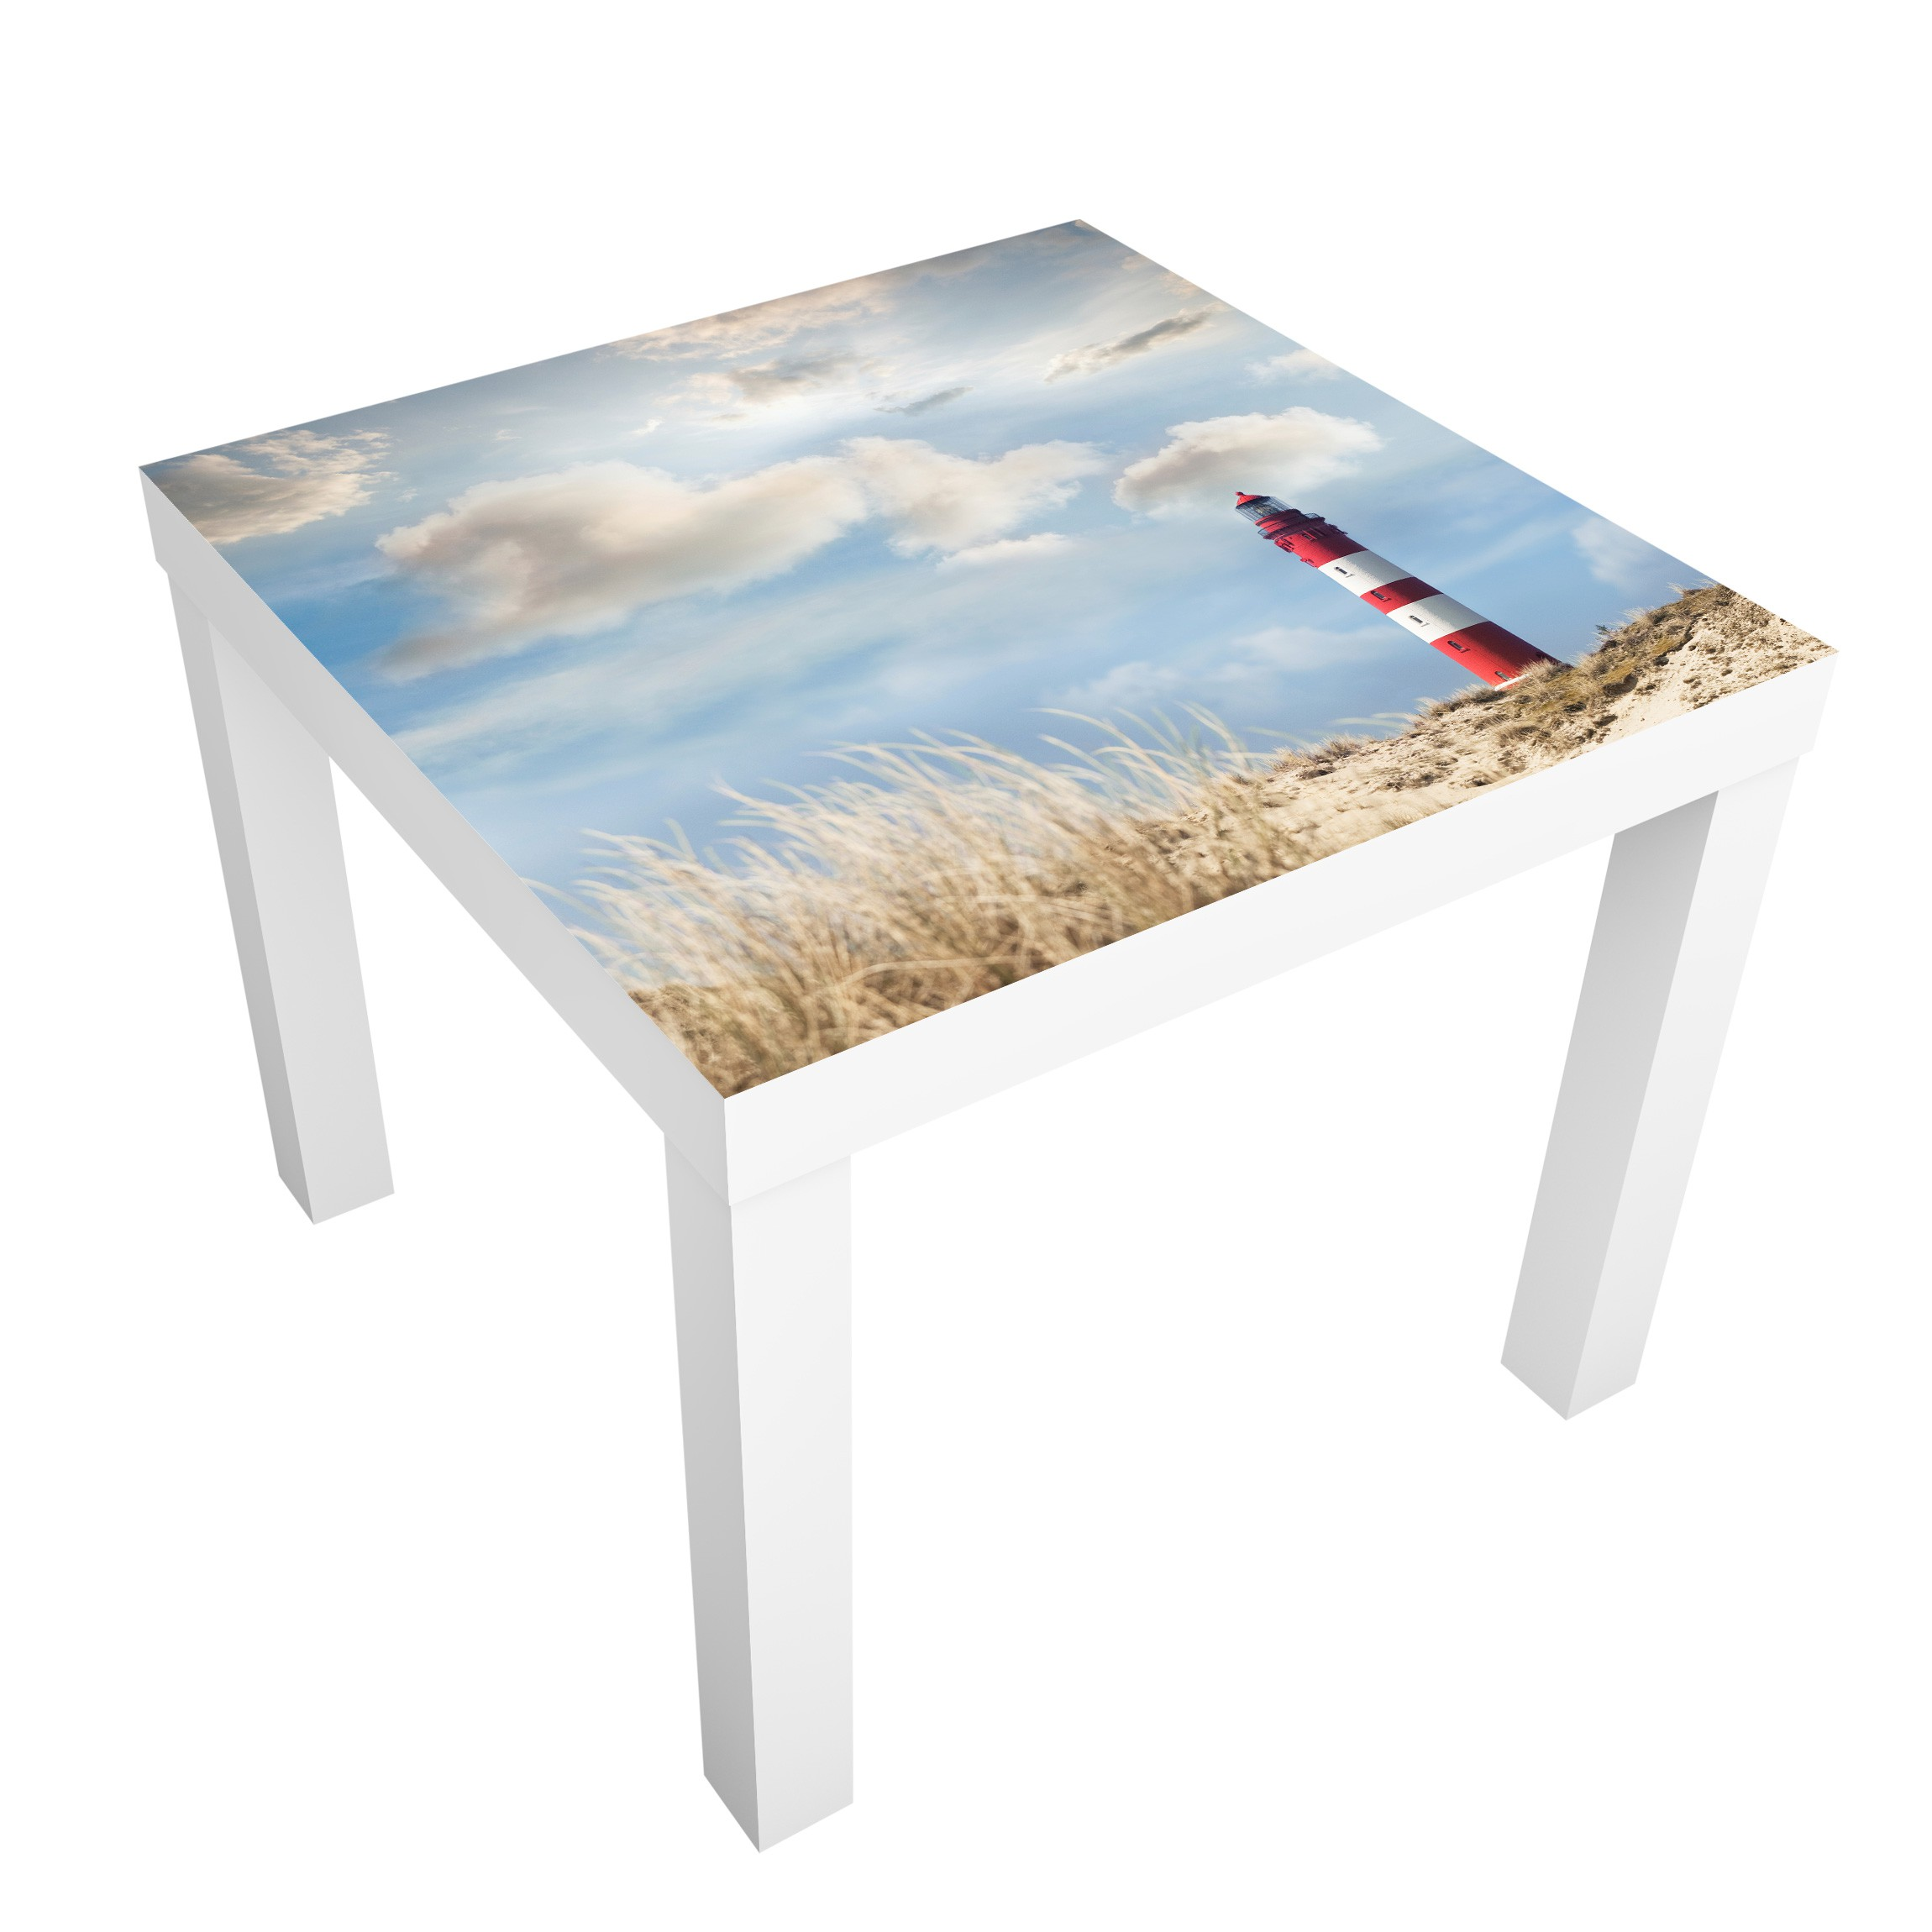 Carta adesiva per mobili ikea lack tavolino lighthouse in the dunes - Lack tavolino ikea ...